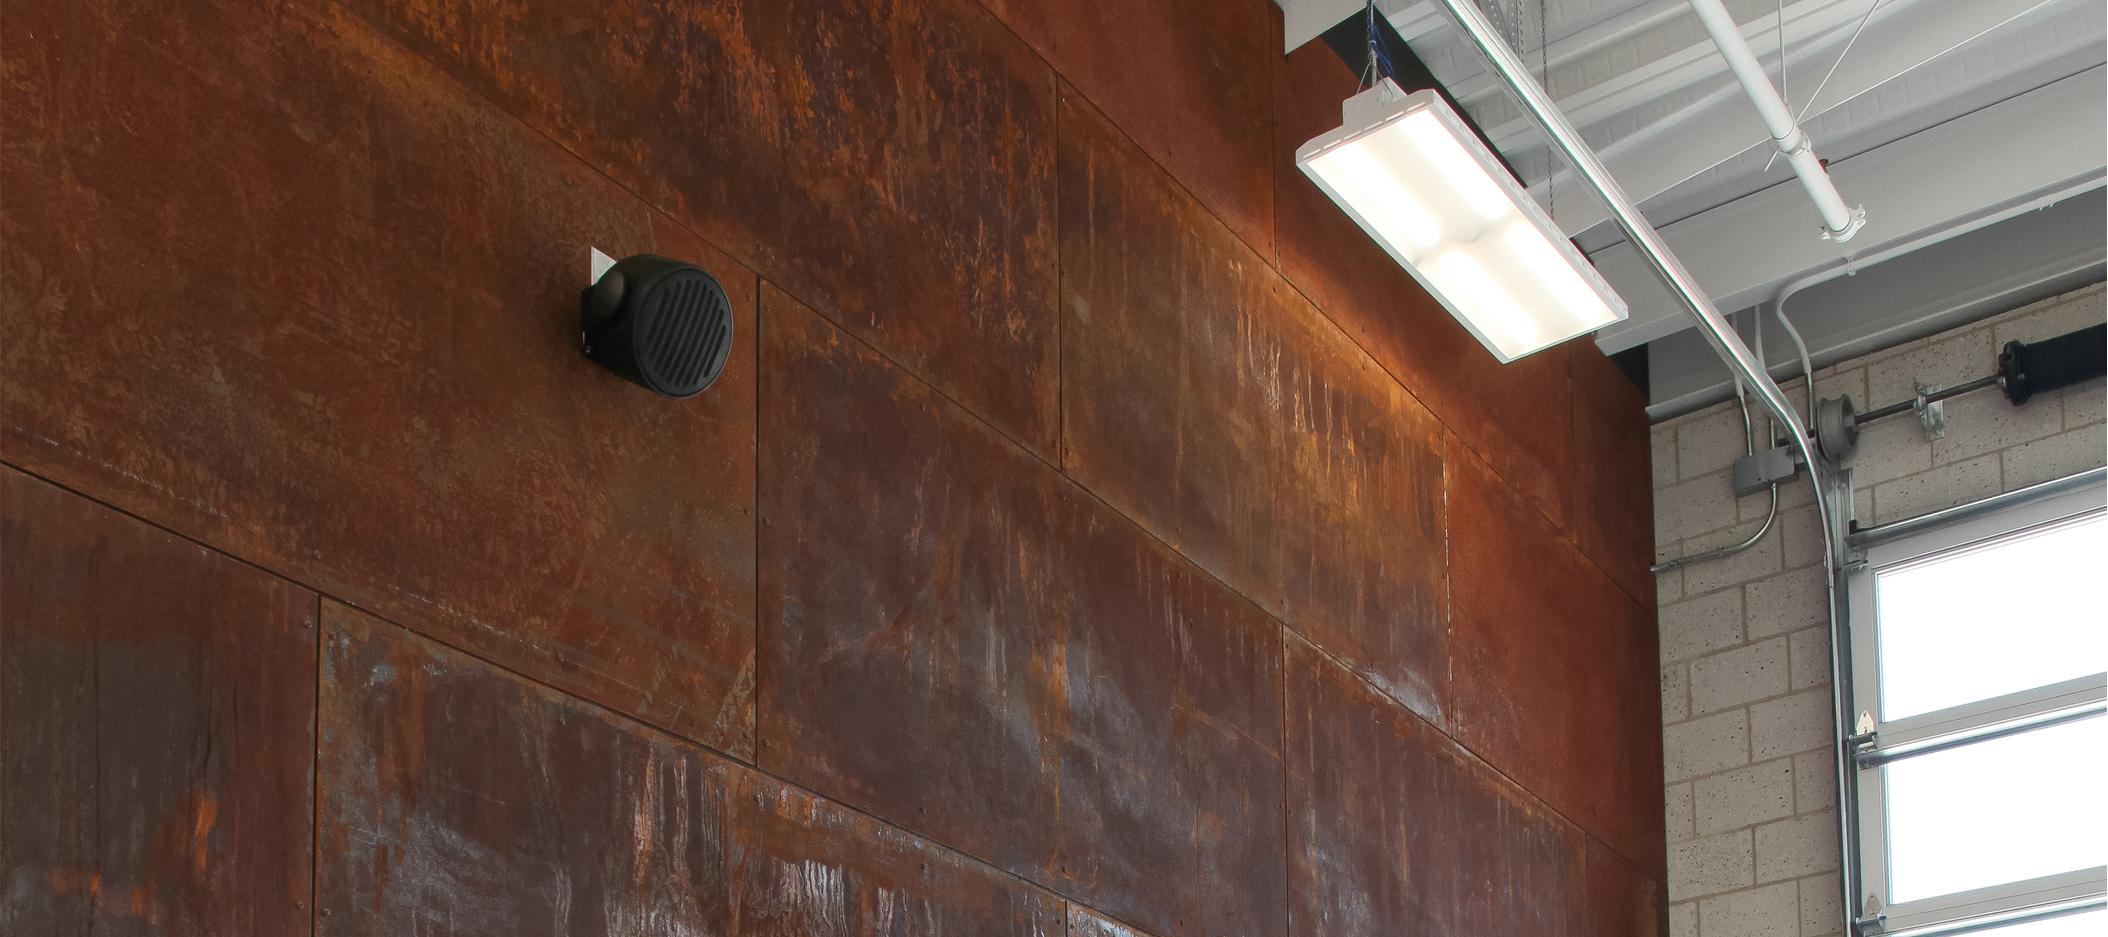 header image of garage wall paneling